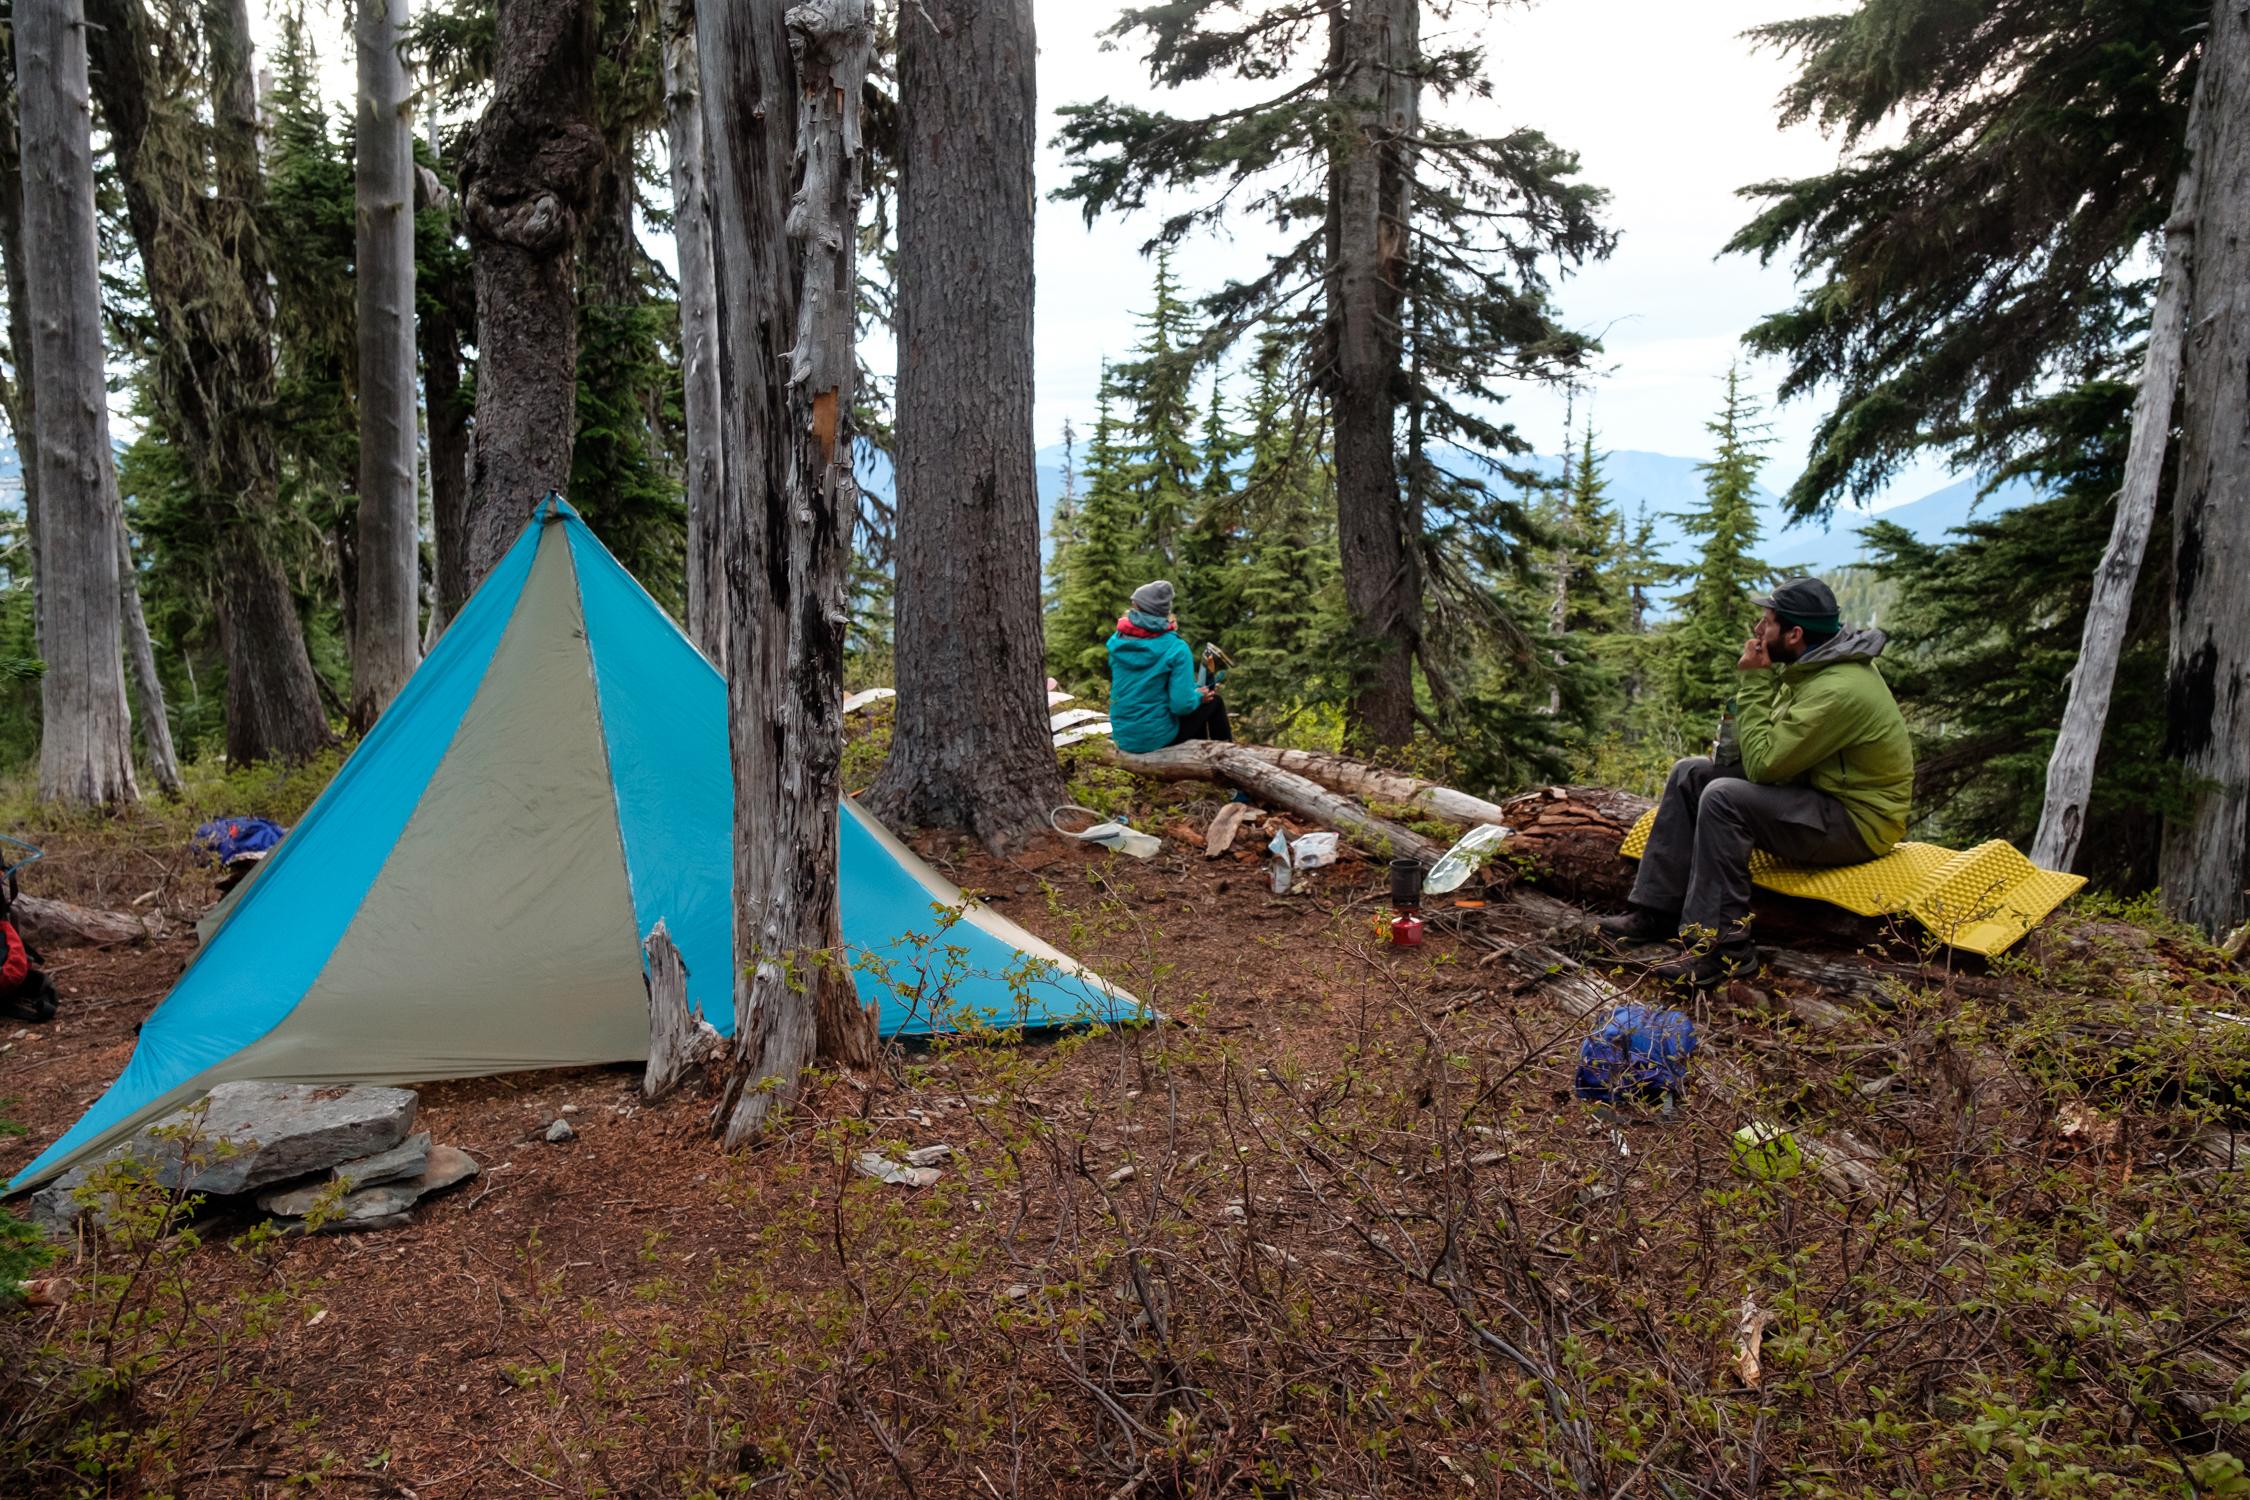 Black Diamond Mega Light Tent - The Snowboarders Journal